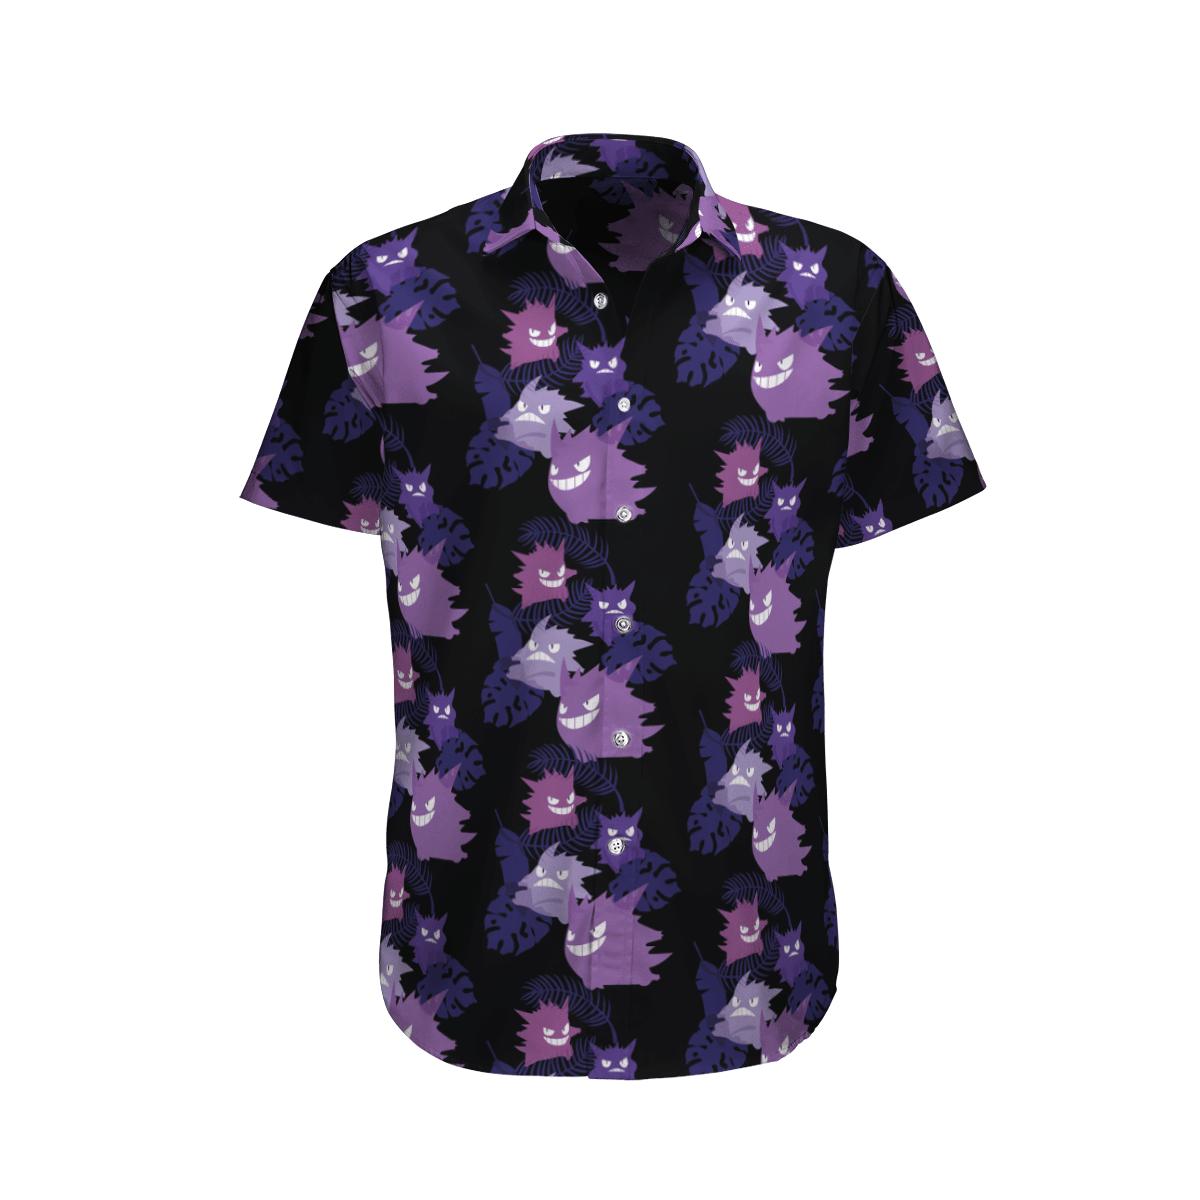 Black Gengar Ghost pokemon Hawaiian Shirt and Beach Shorts